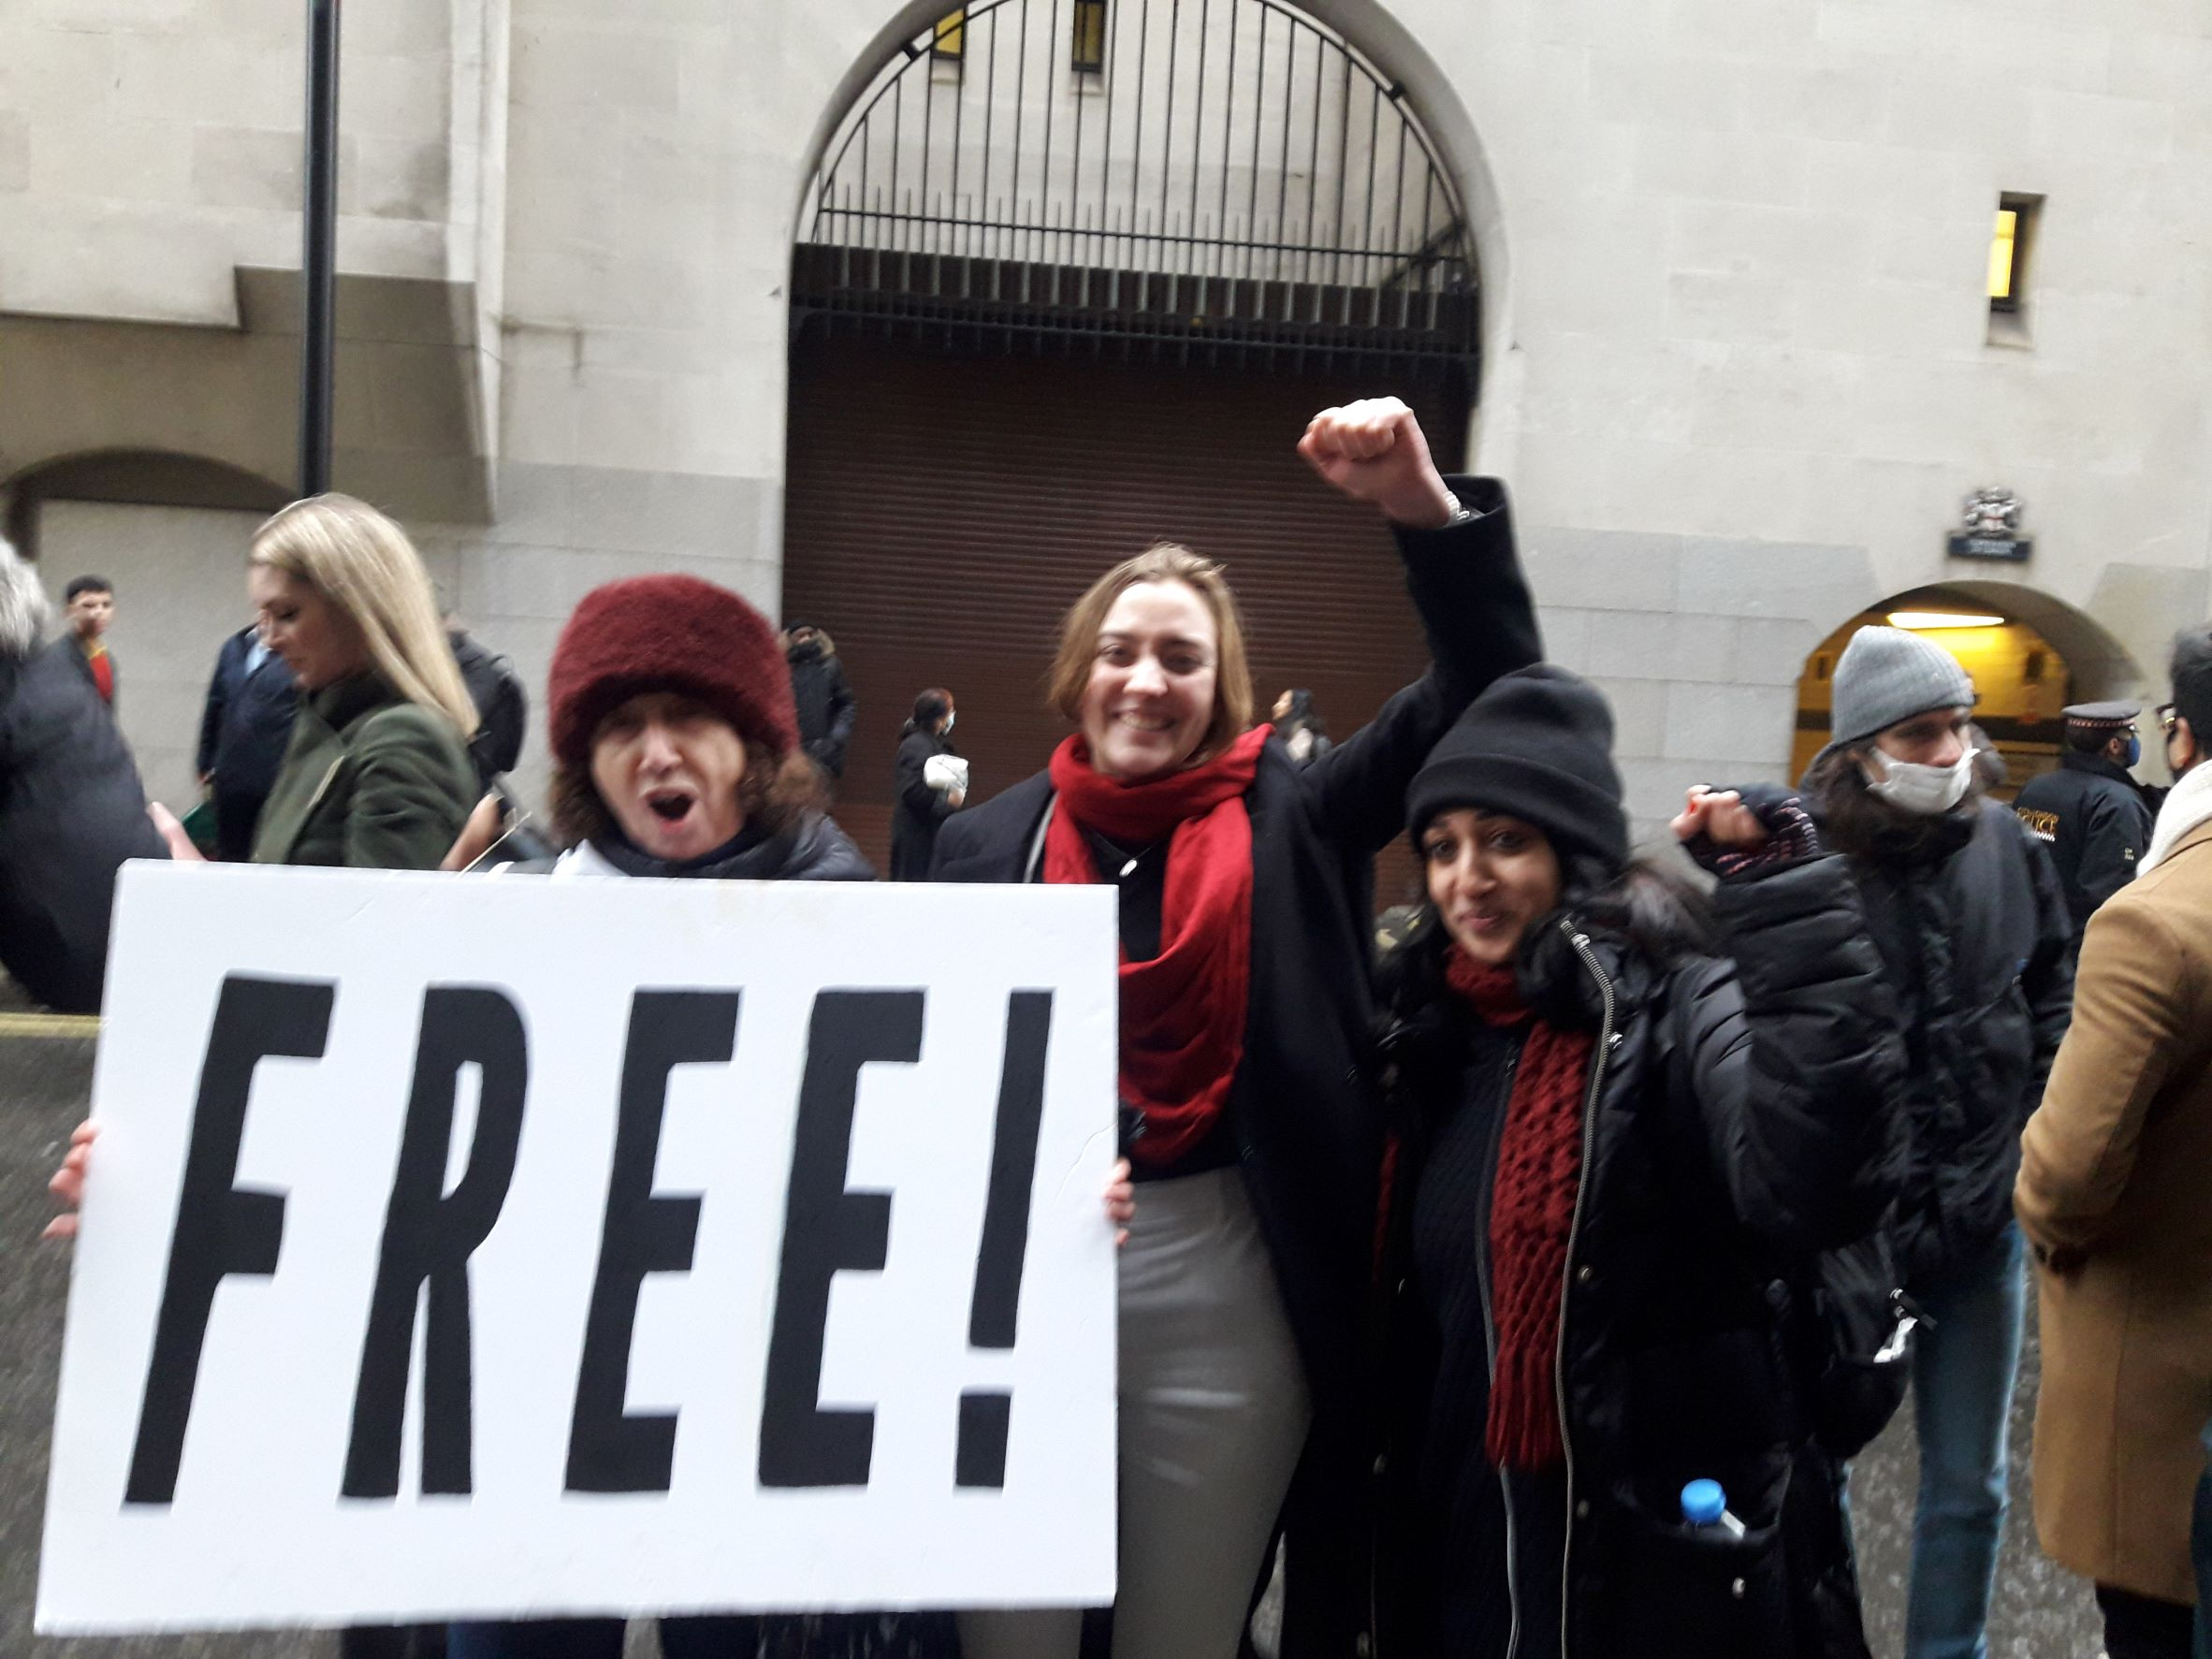 protest_photos:freewomen.jpg